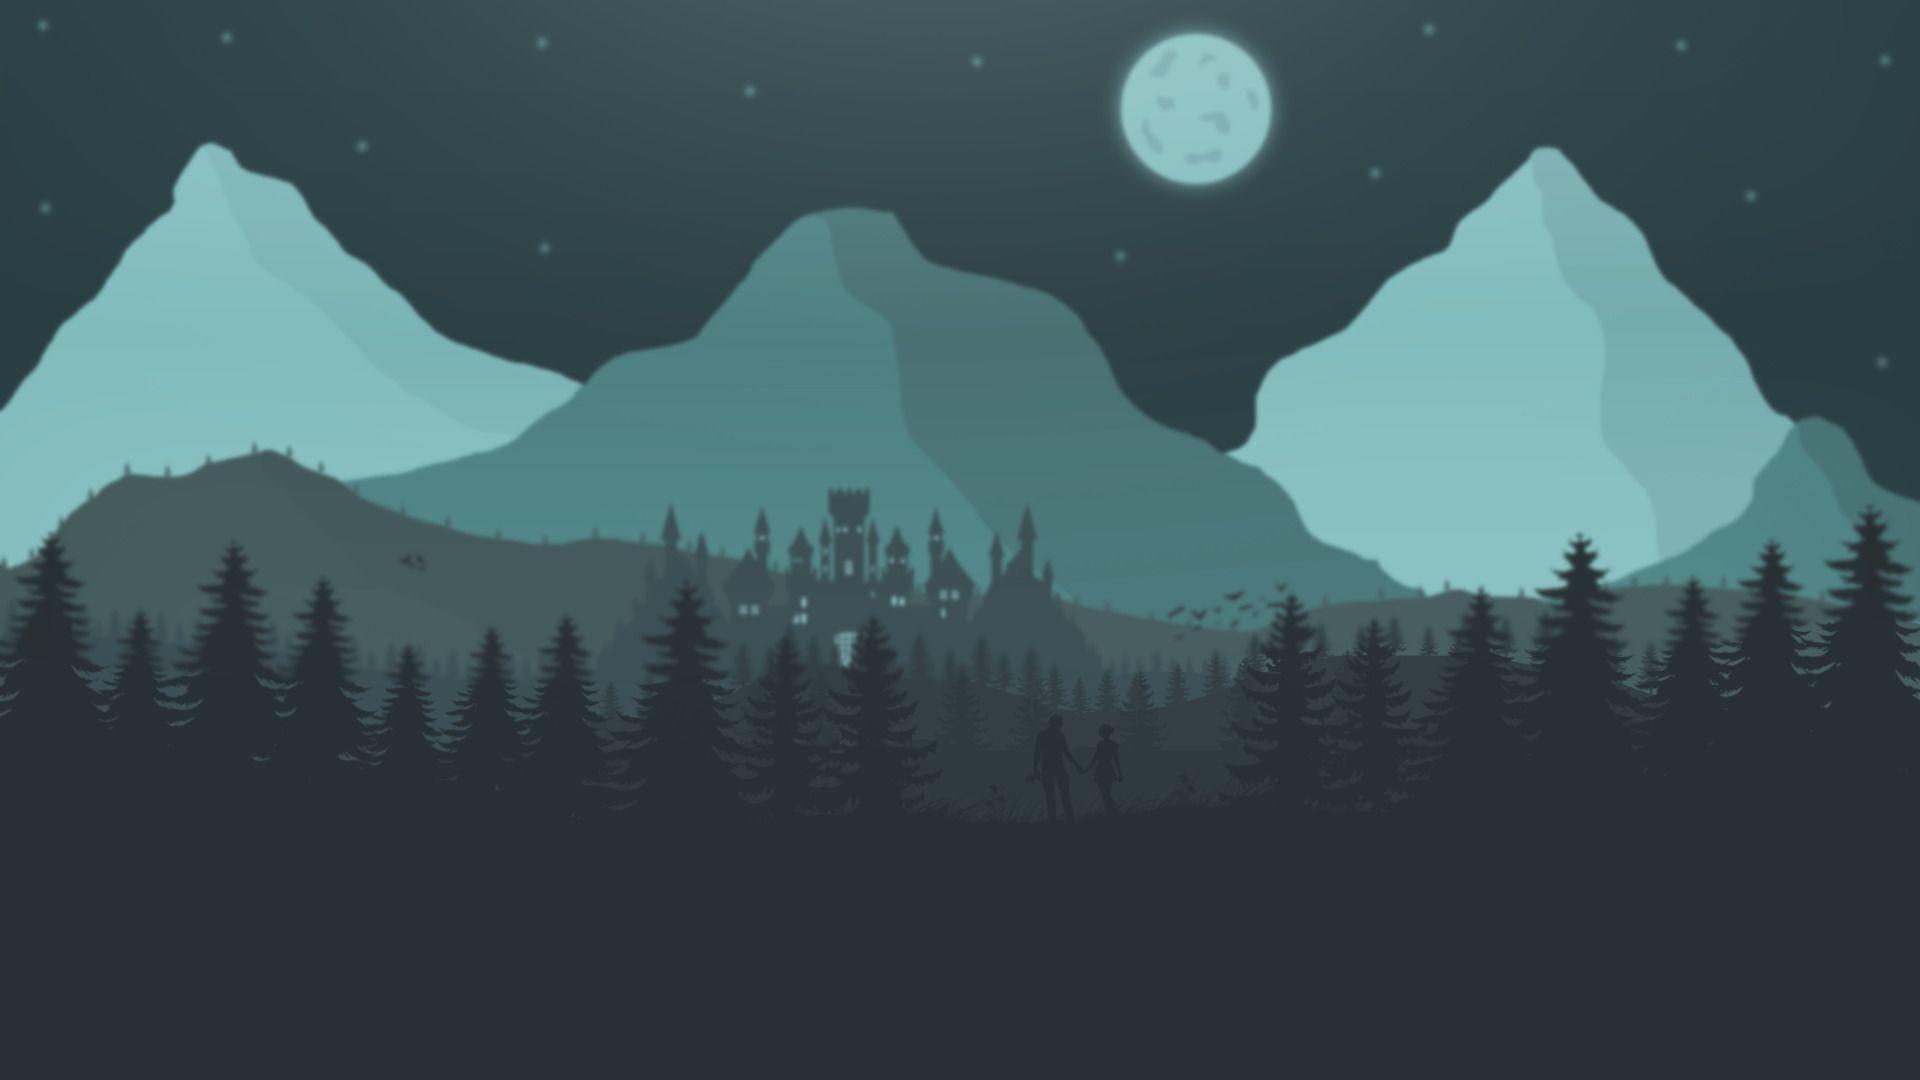 Flat Landscape, Minimalism Wallpapers Mountains